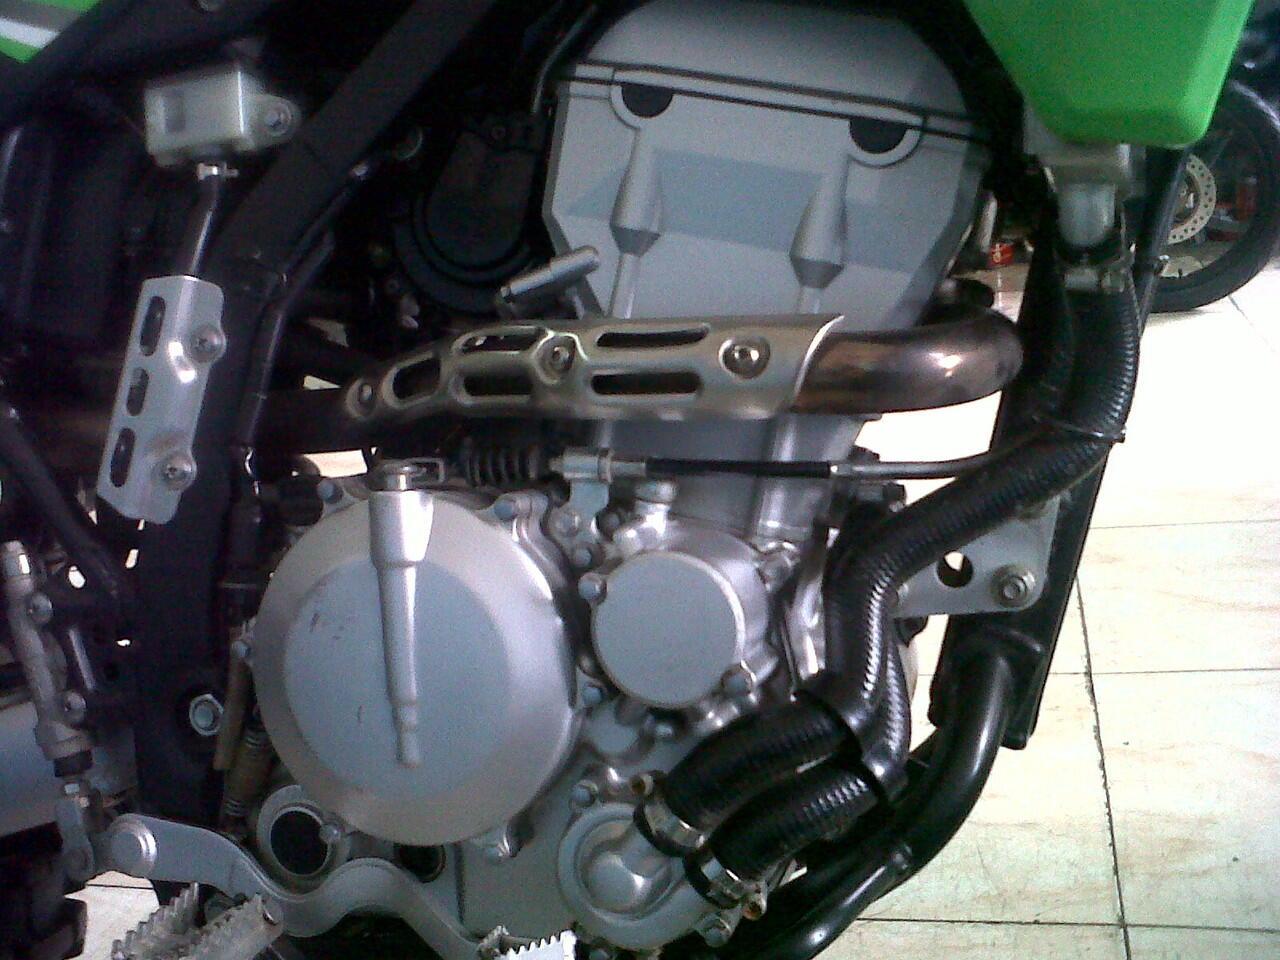 KREDIT MOTOR KAWASAKI KLX 250cc 2012 STOK TERBATAS